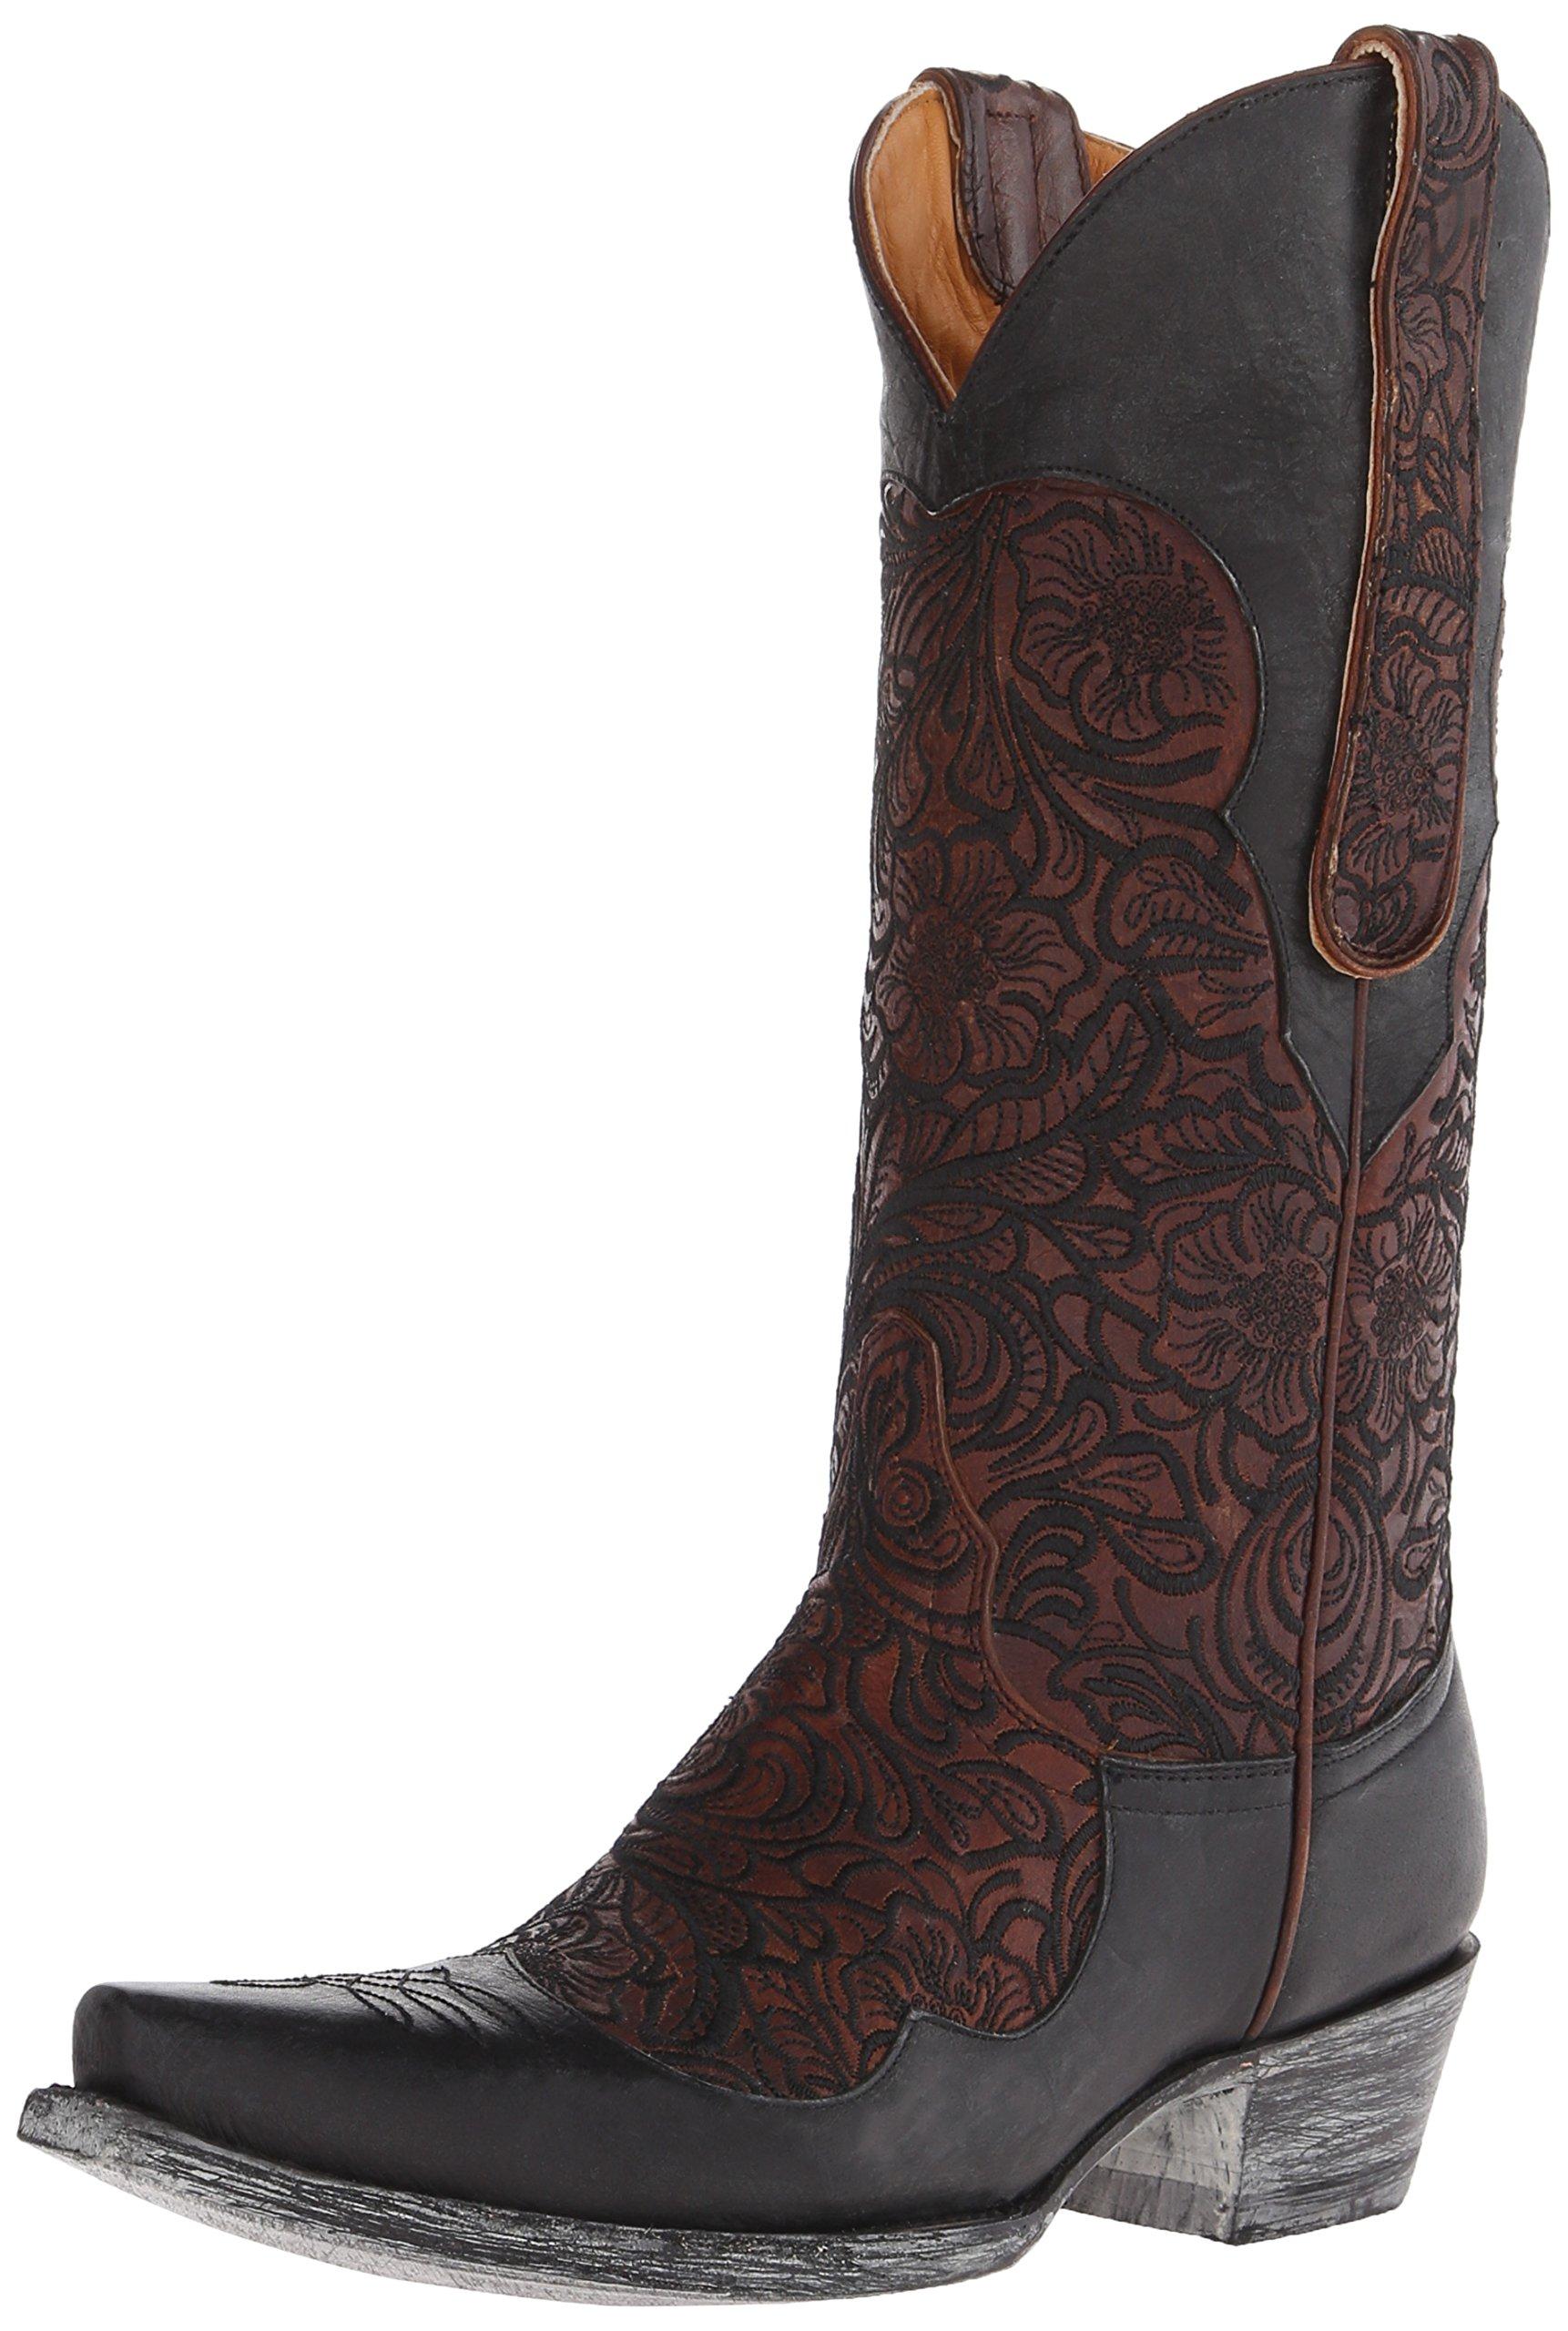 Old Gringo Women's Feita Western Boot, Brass/Black, 8 B US